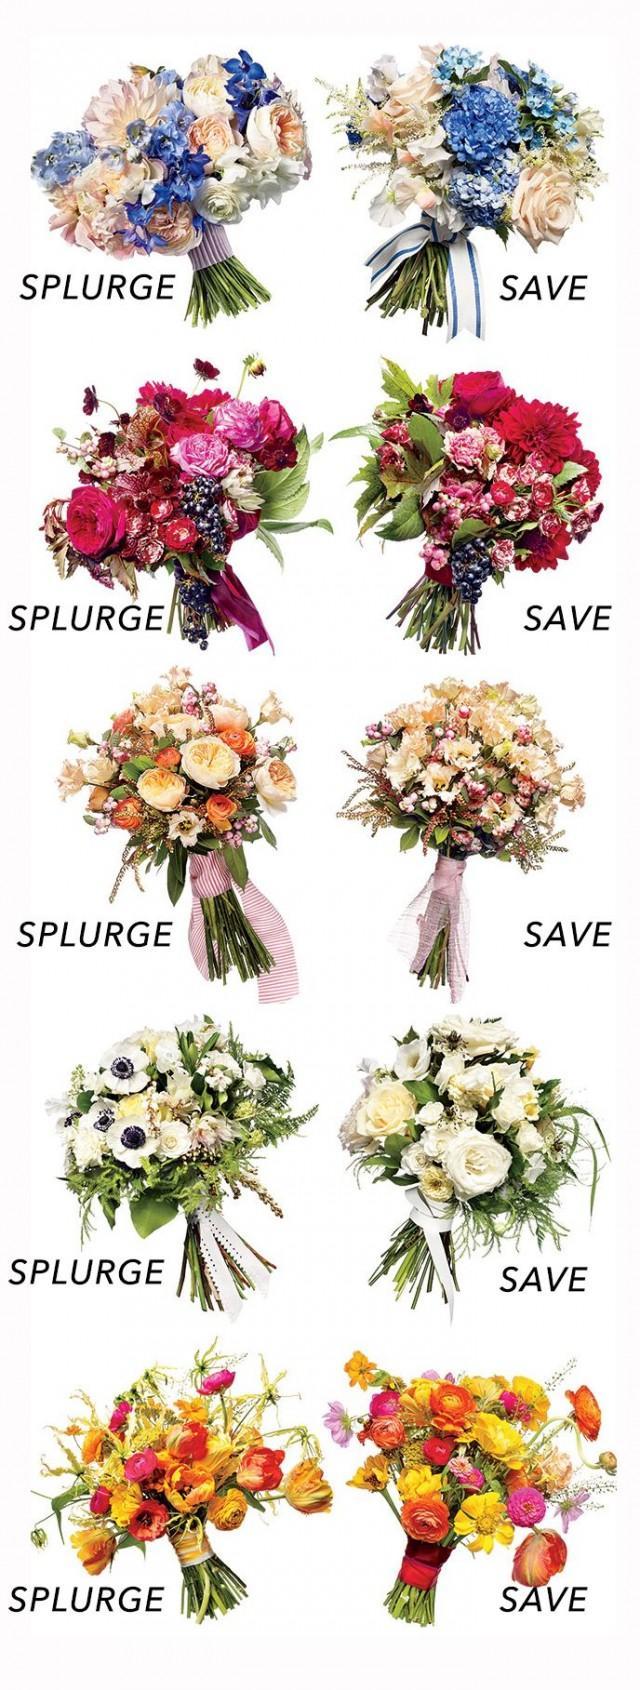 bouquet flower save vs splurge wedding bouquets 2234019 weddbook. Black Bedroom Furniture Sets. Home Design Ideas